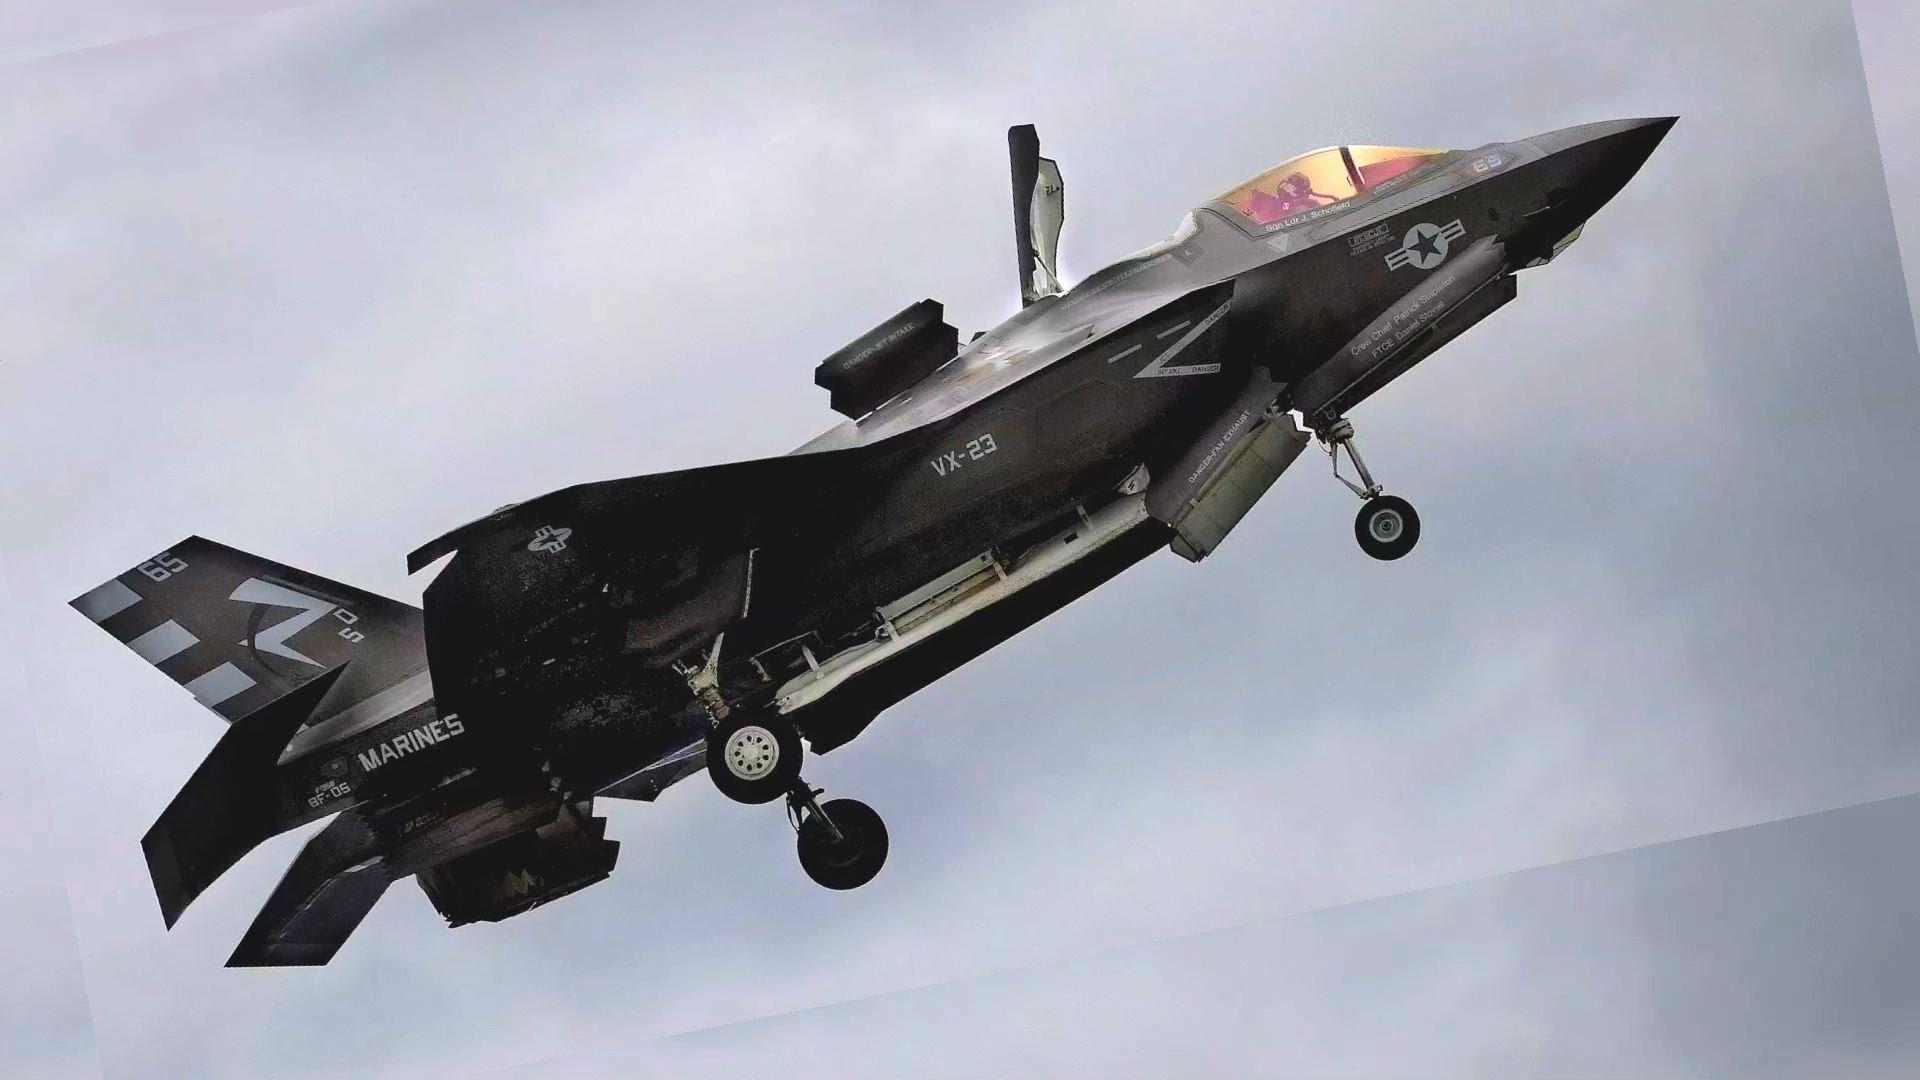 Resultado de imagem para f-35 lightning